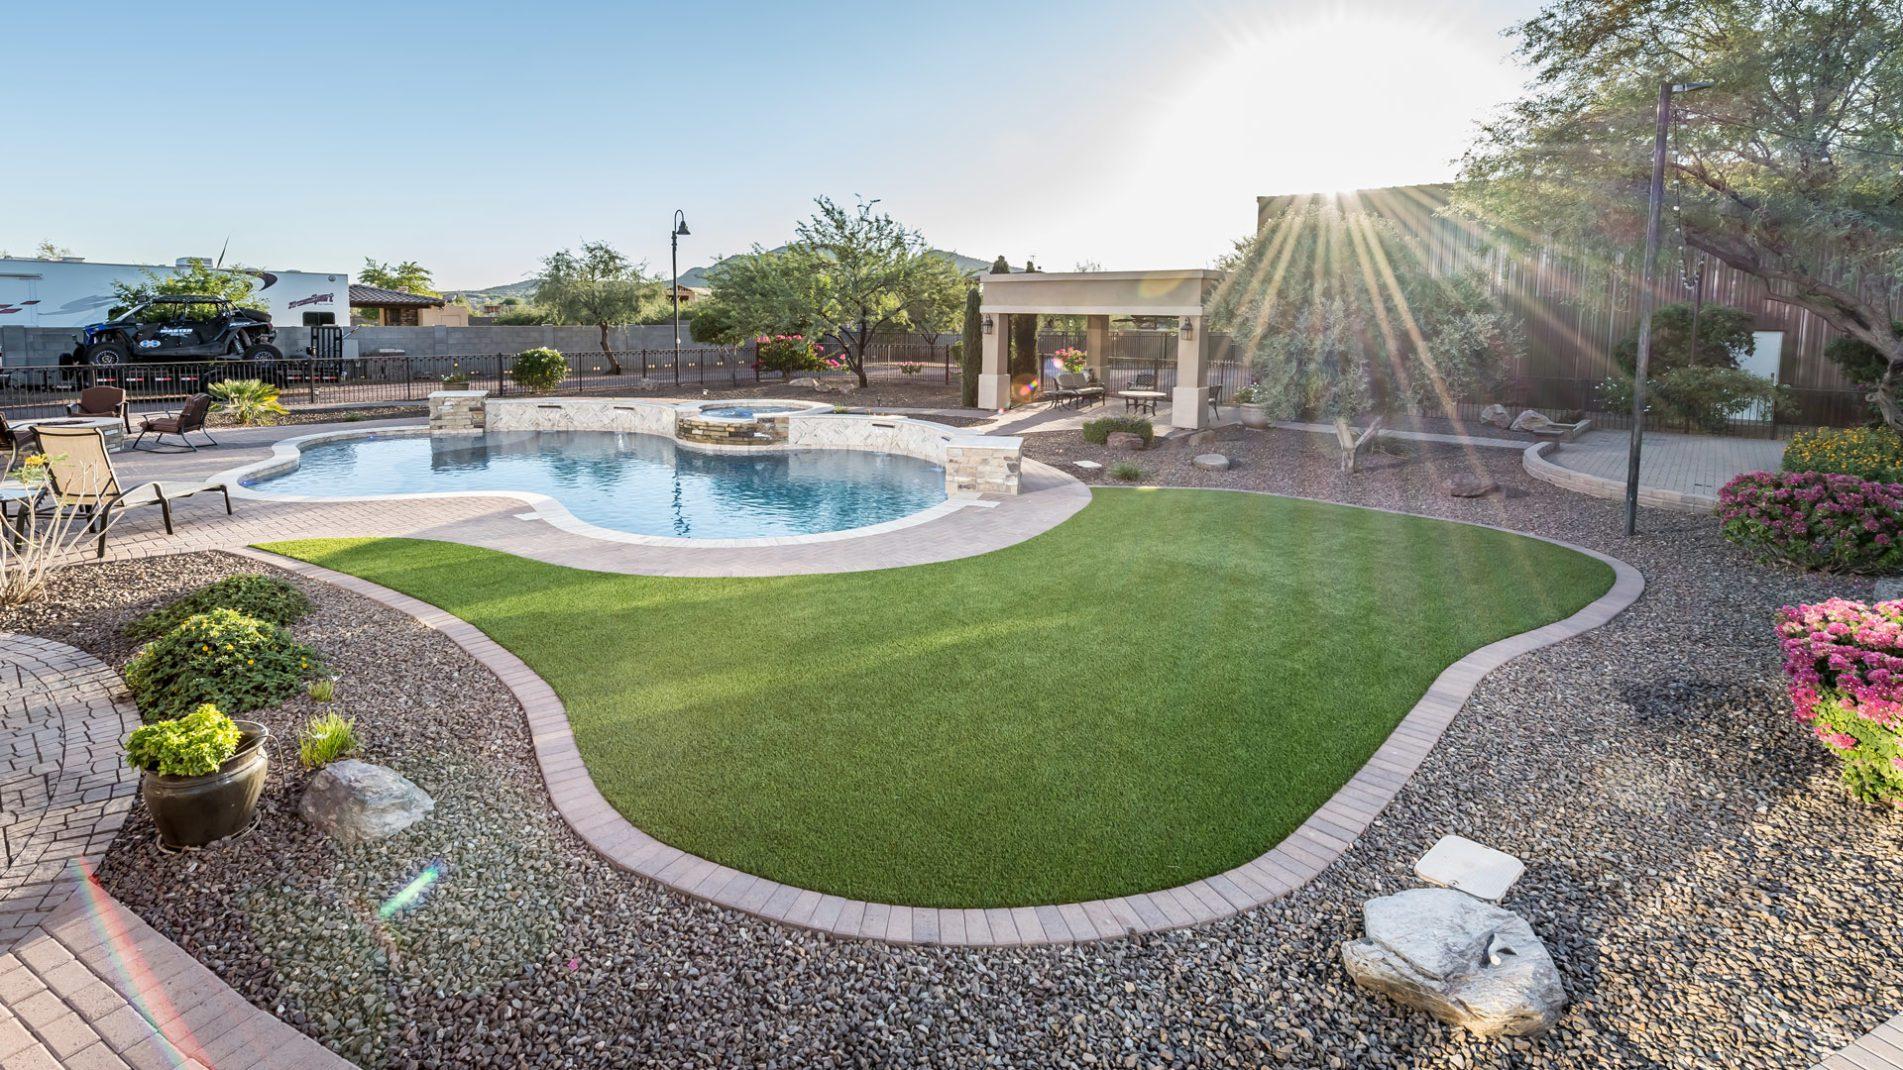 Landscape View of Freeform Swimming Pool In Phoenix